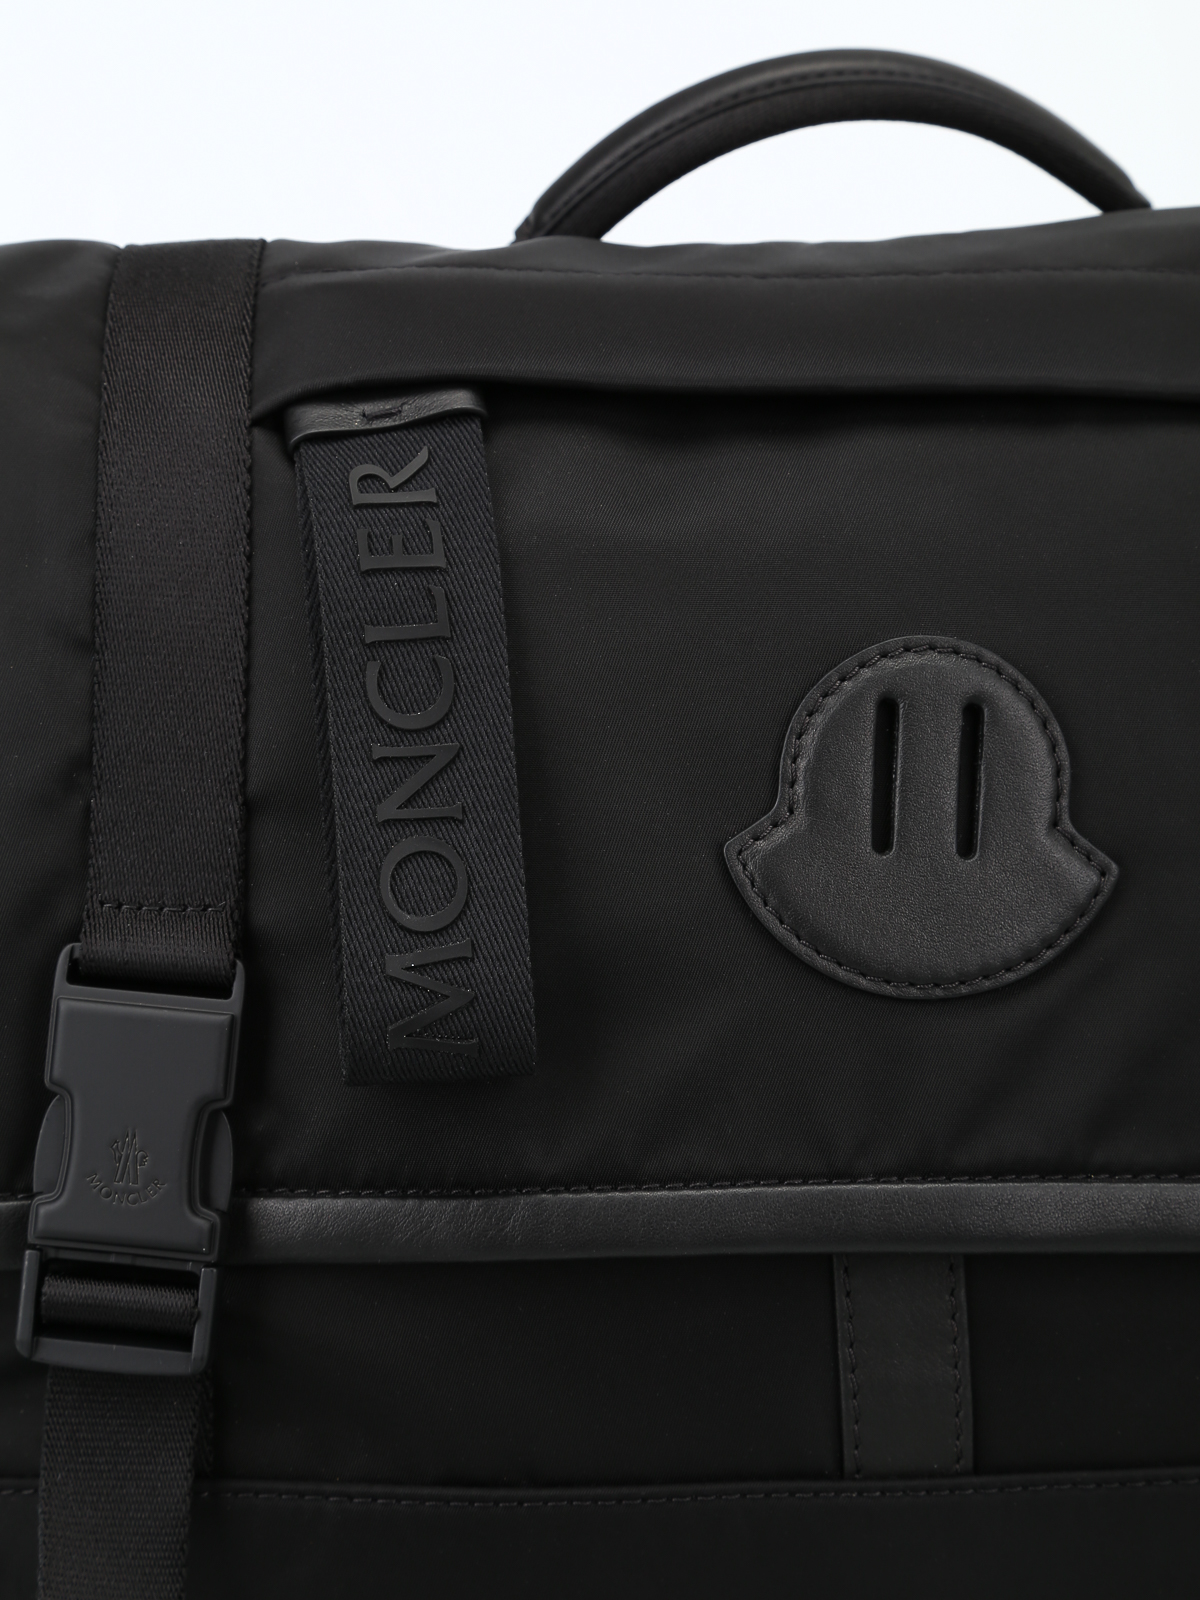 finest selection 66e50 7cd44 Moncler - Stratus black nylon bag - laptop bags & briefcases ...